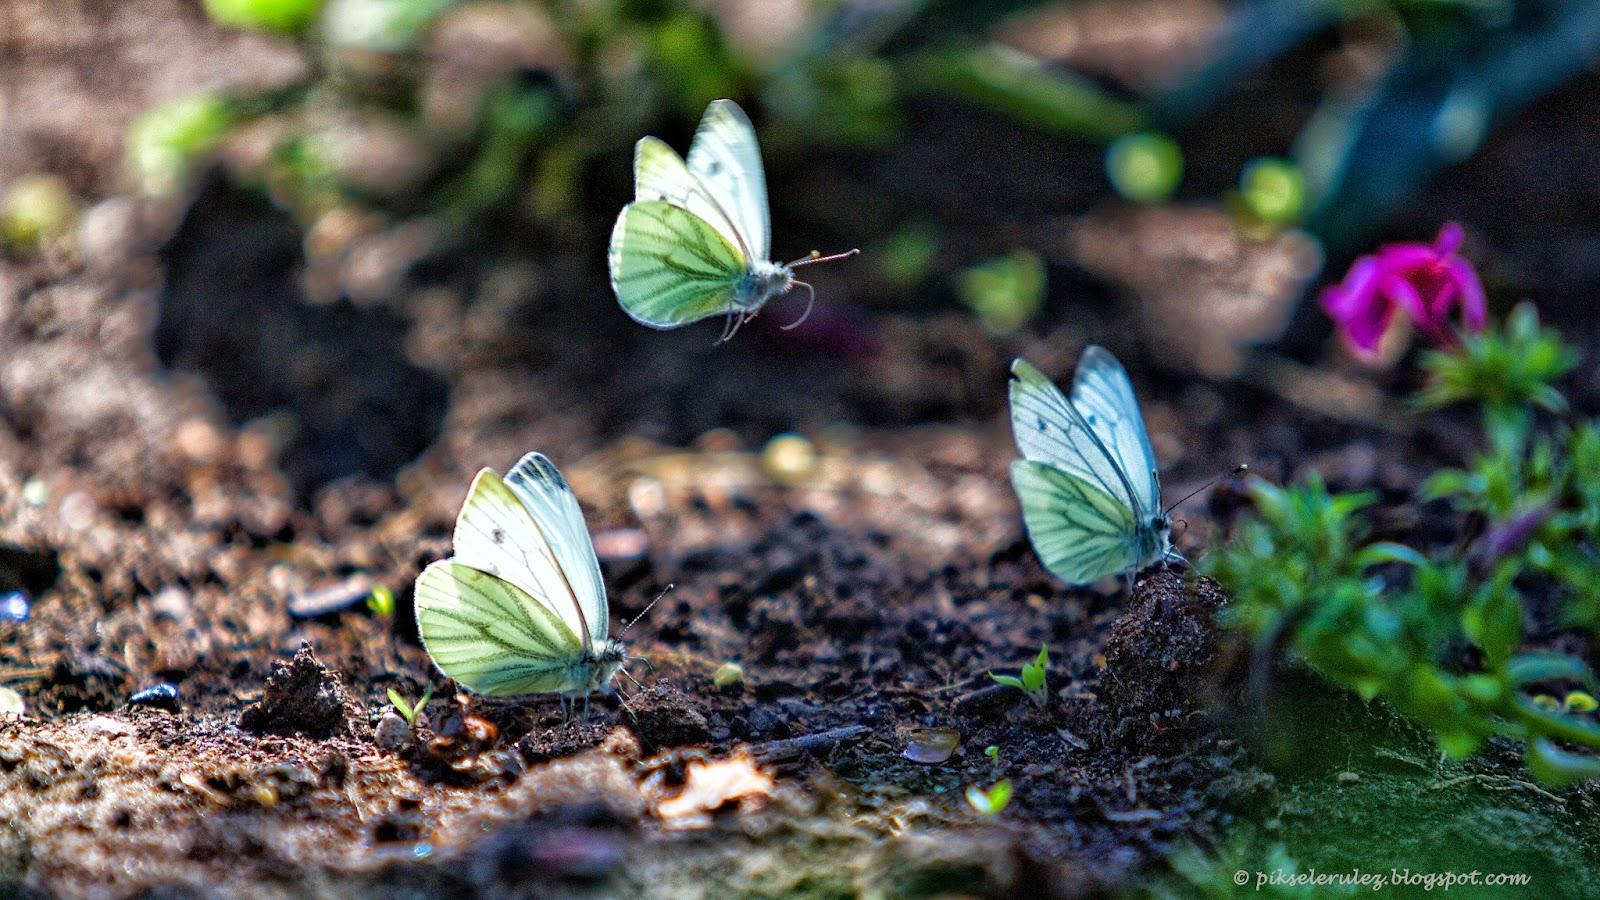 motyle, Bory Tucholskie, kolor, natura, Lotyń, Agata Raszke,